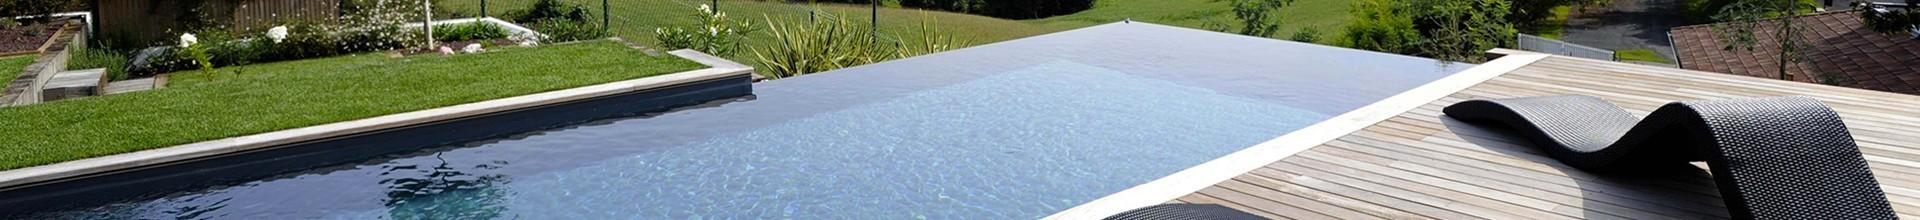 Direct usine, piscine coque prix Vienne